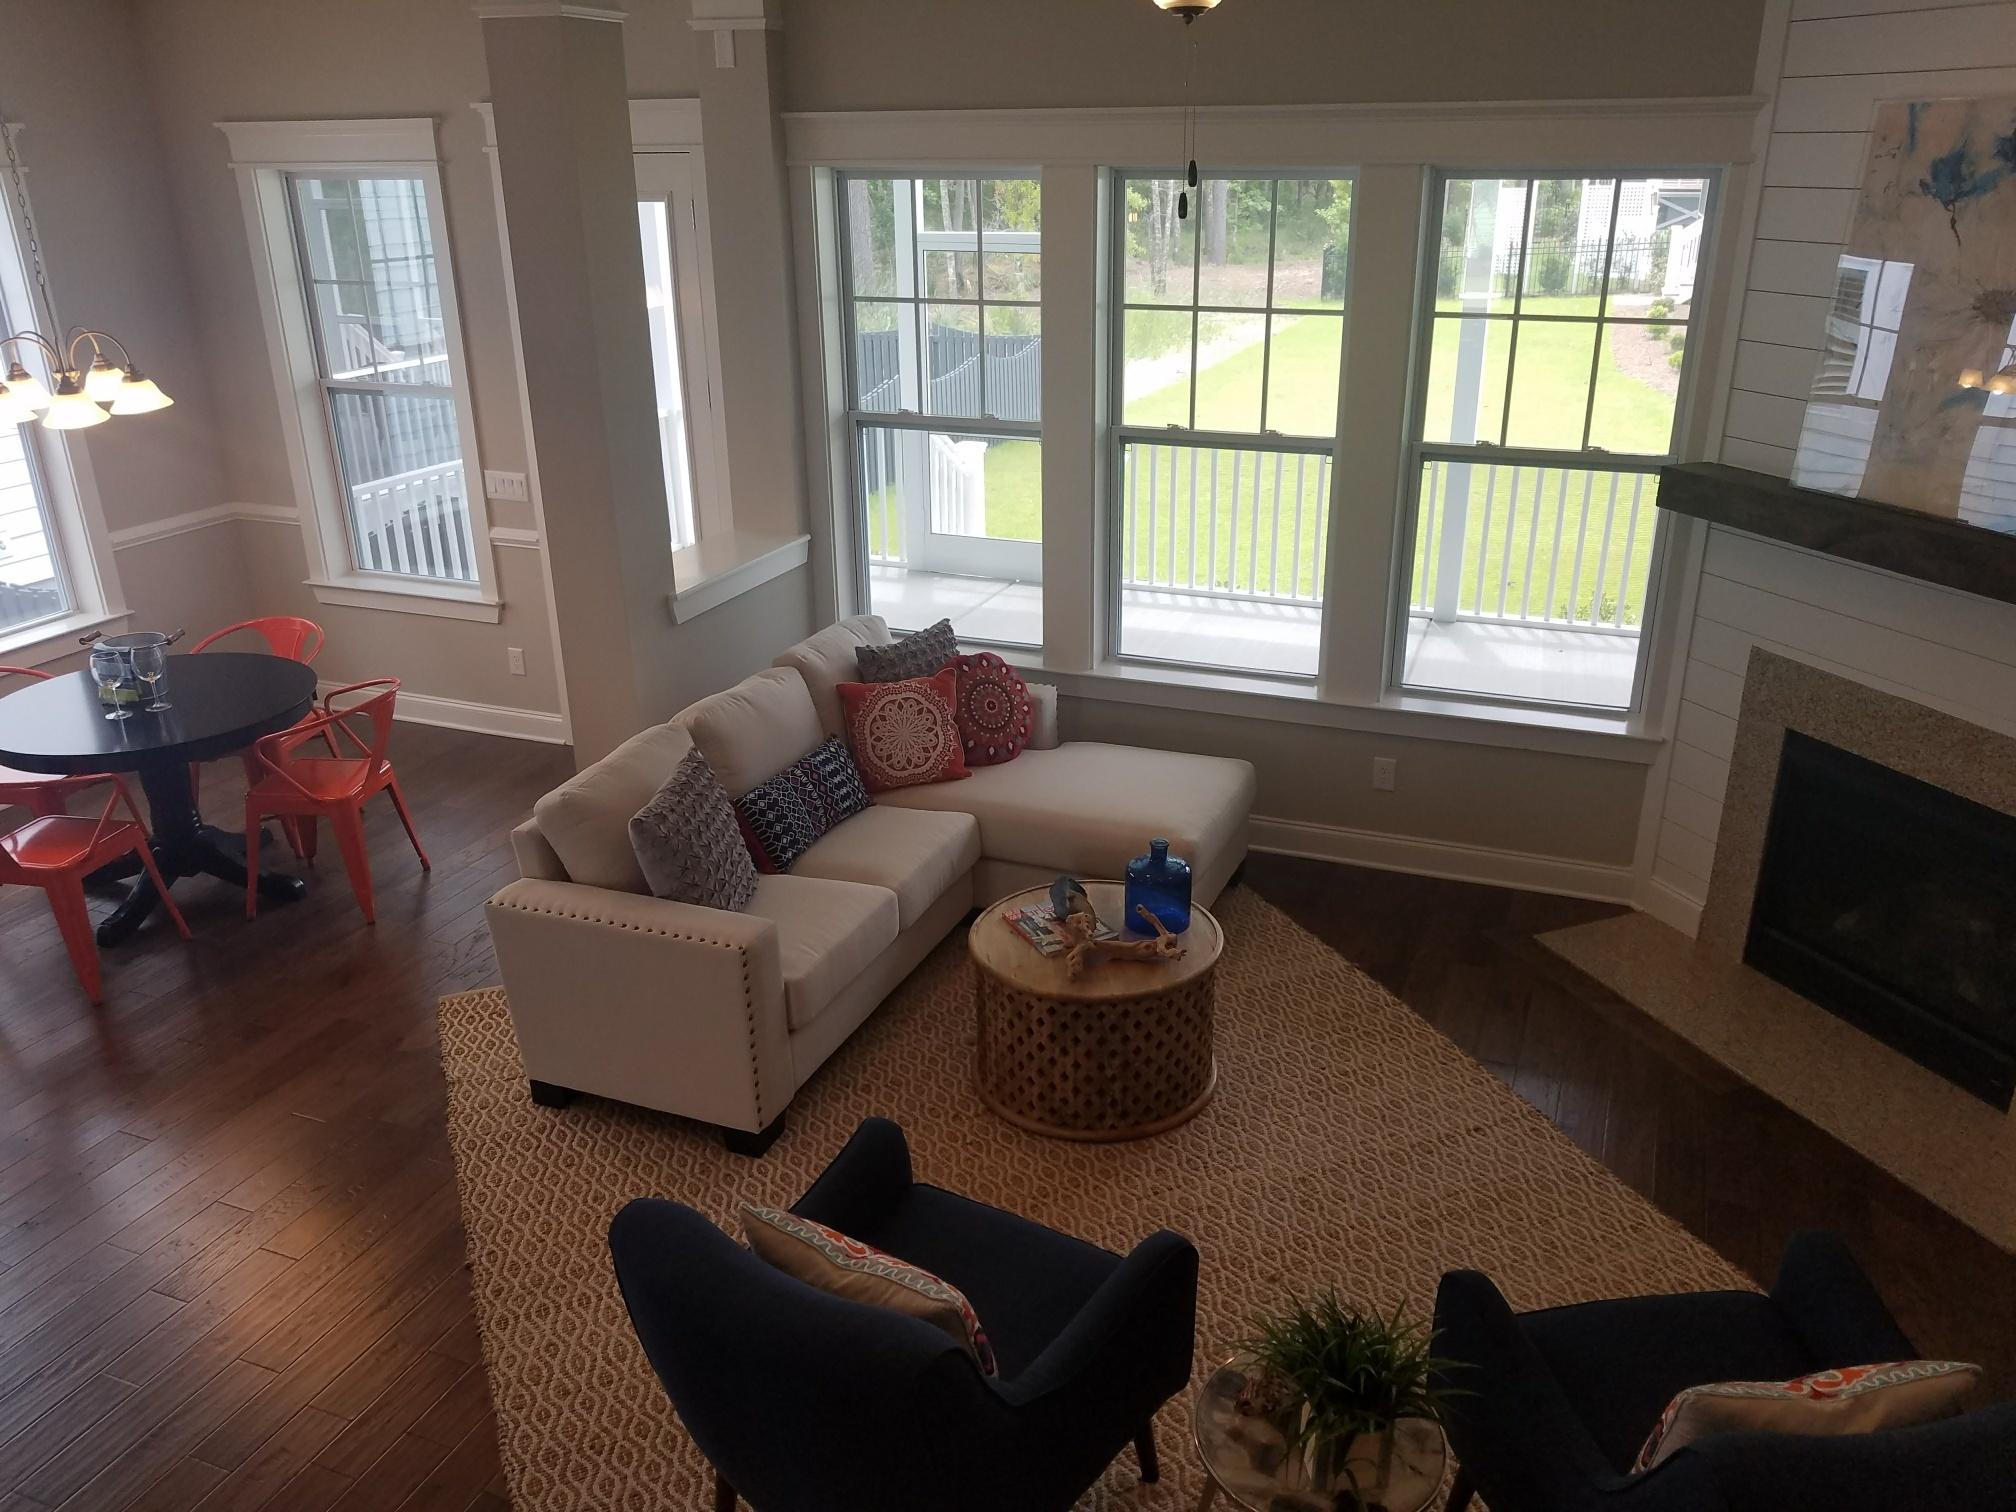 Carolina Park Homes For Sale - 1583 Old Rivers Gate, Mount Pleasant, SC - 33